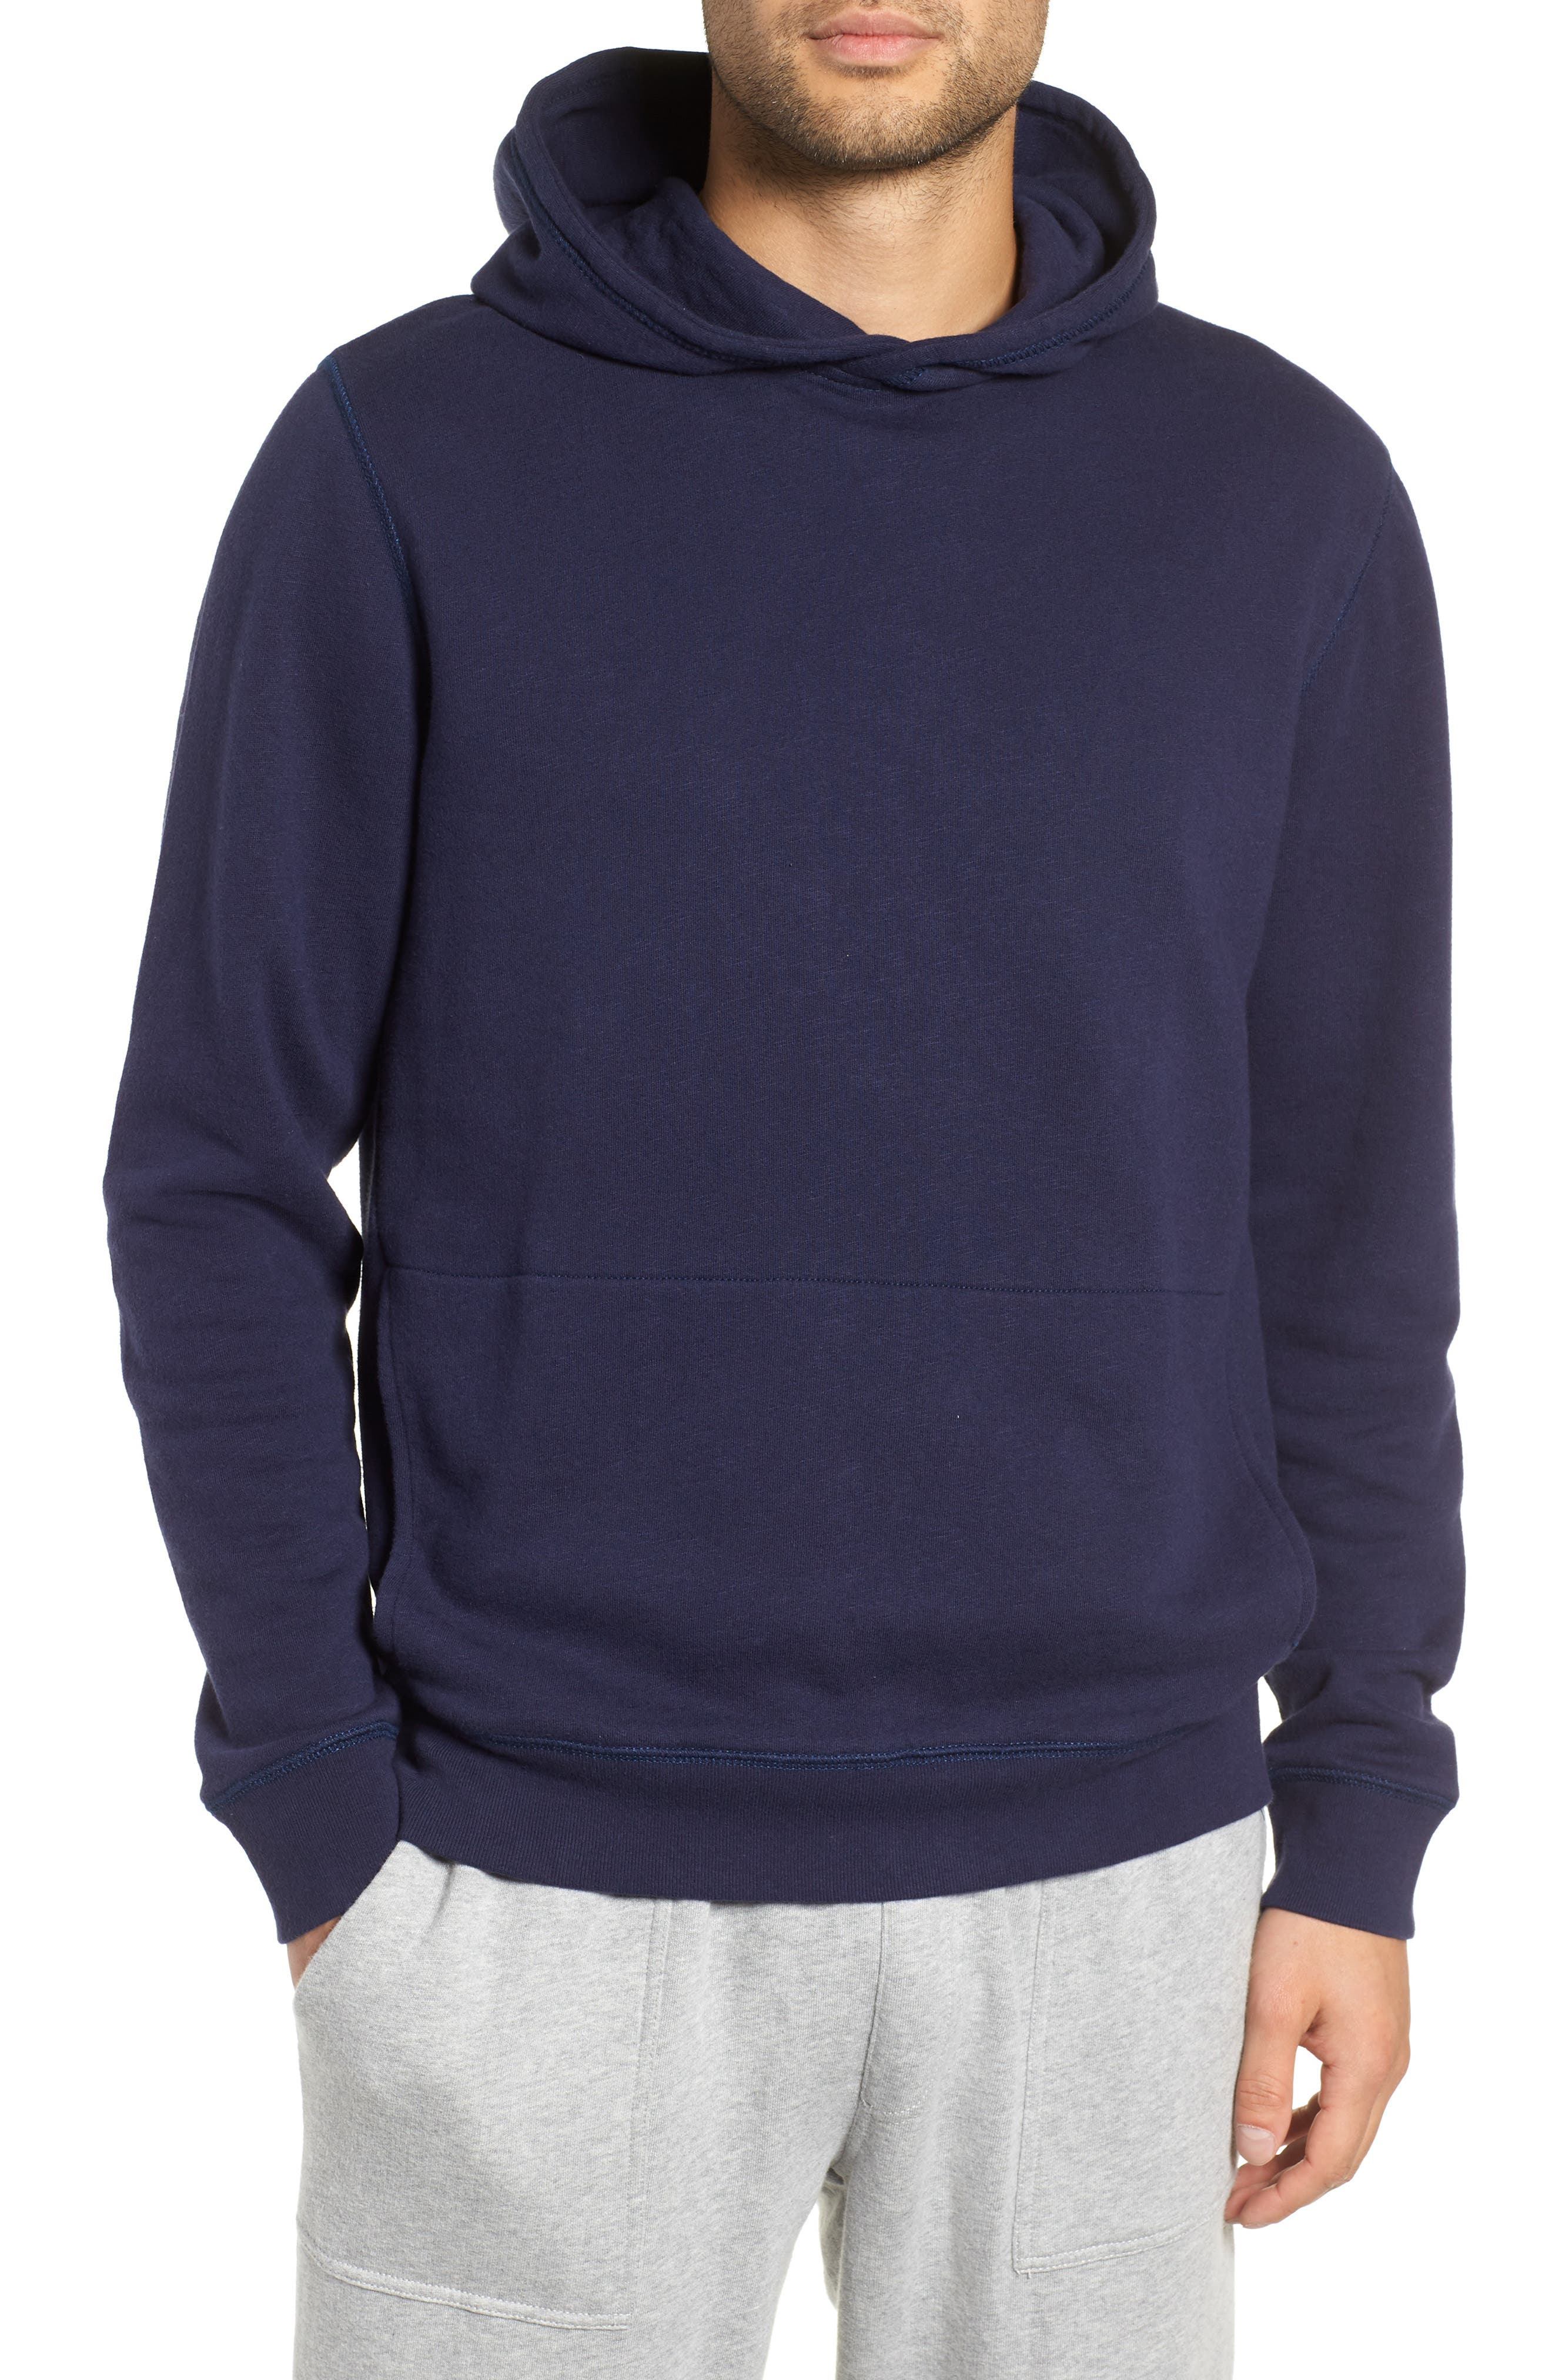 THE RAIL Hooded Sweatshirt, Main, color, 410